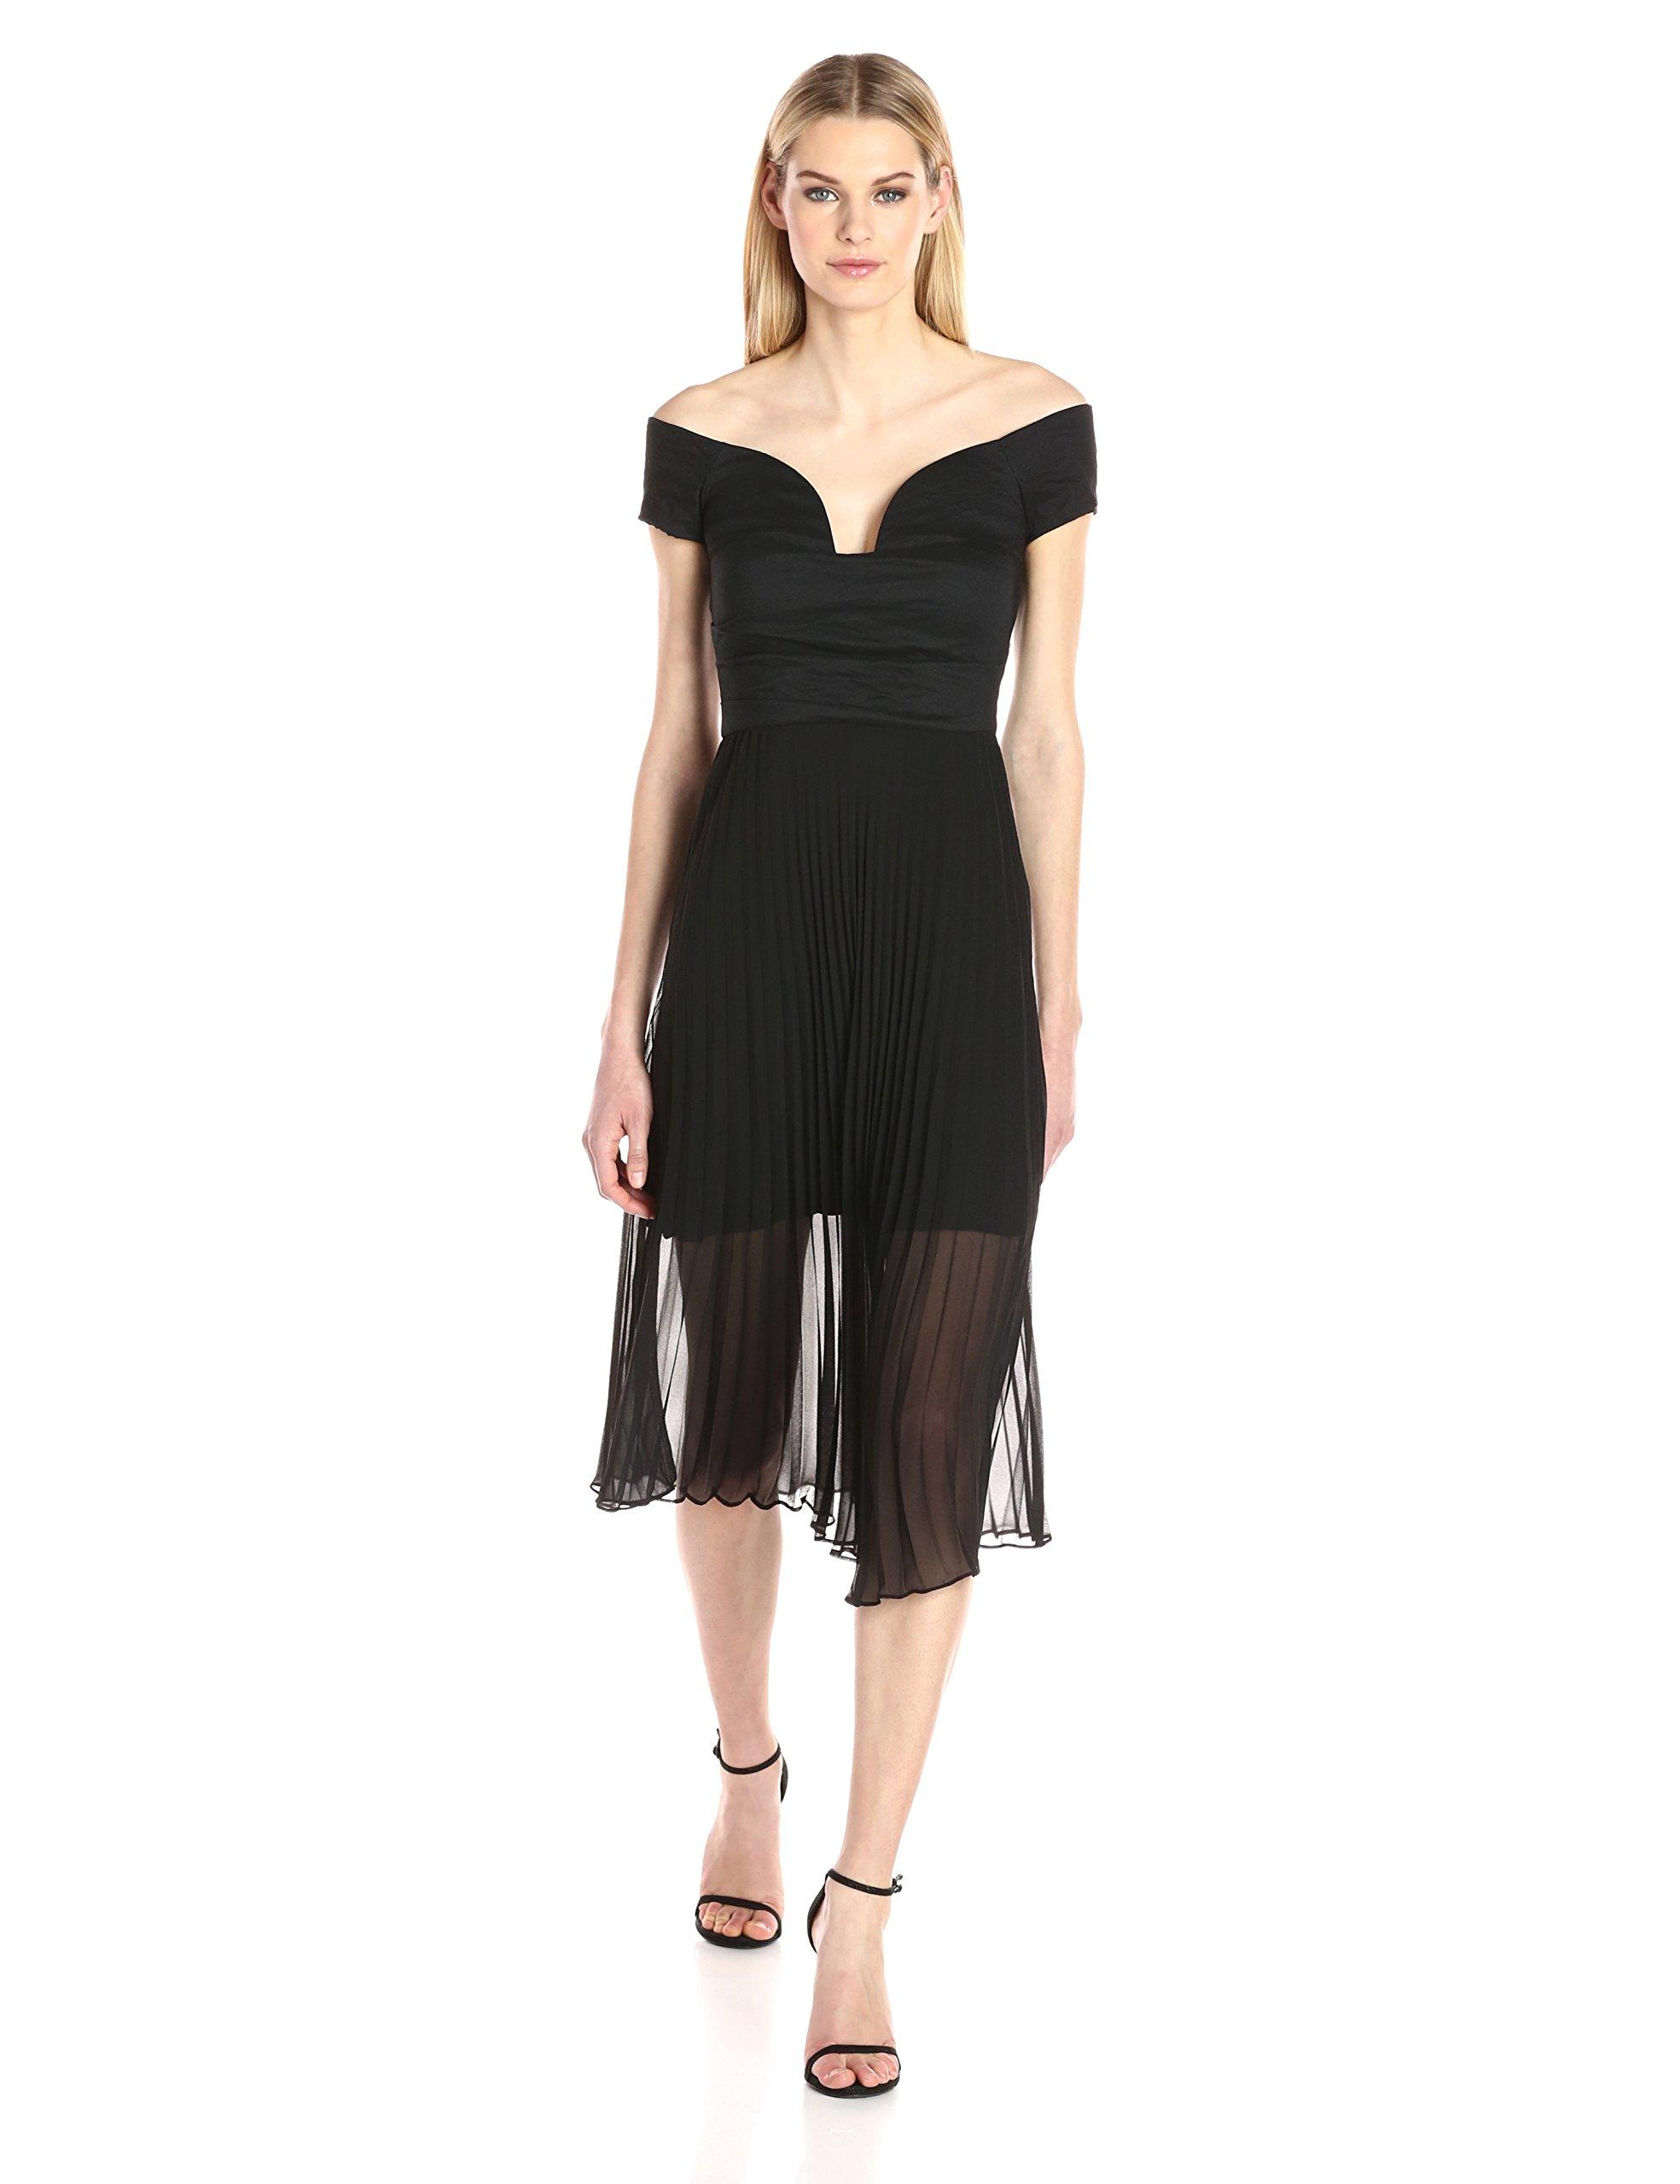 db6ffcee550 Nicole Miller New York Novelty Sleeve Cocktail Dress - Gomes Weine AG